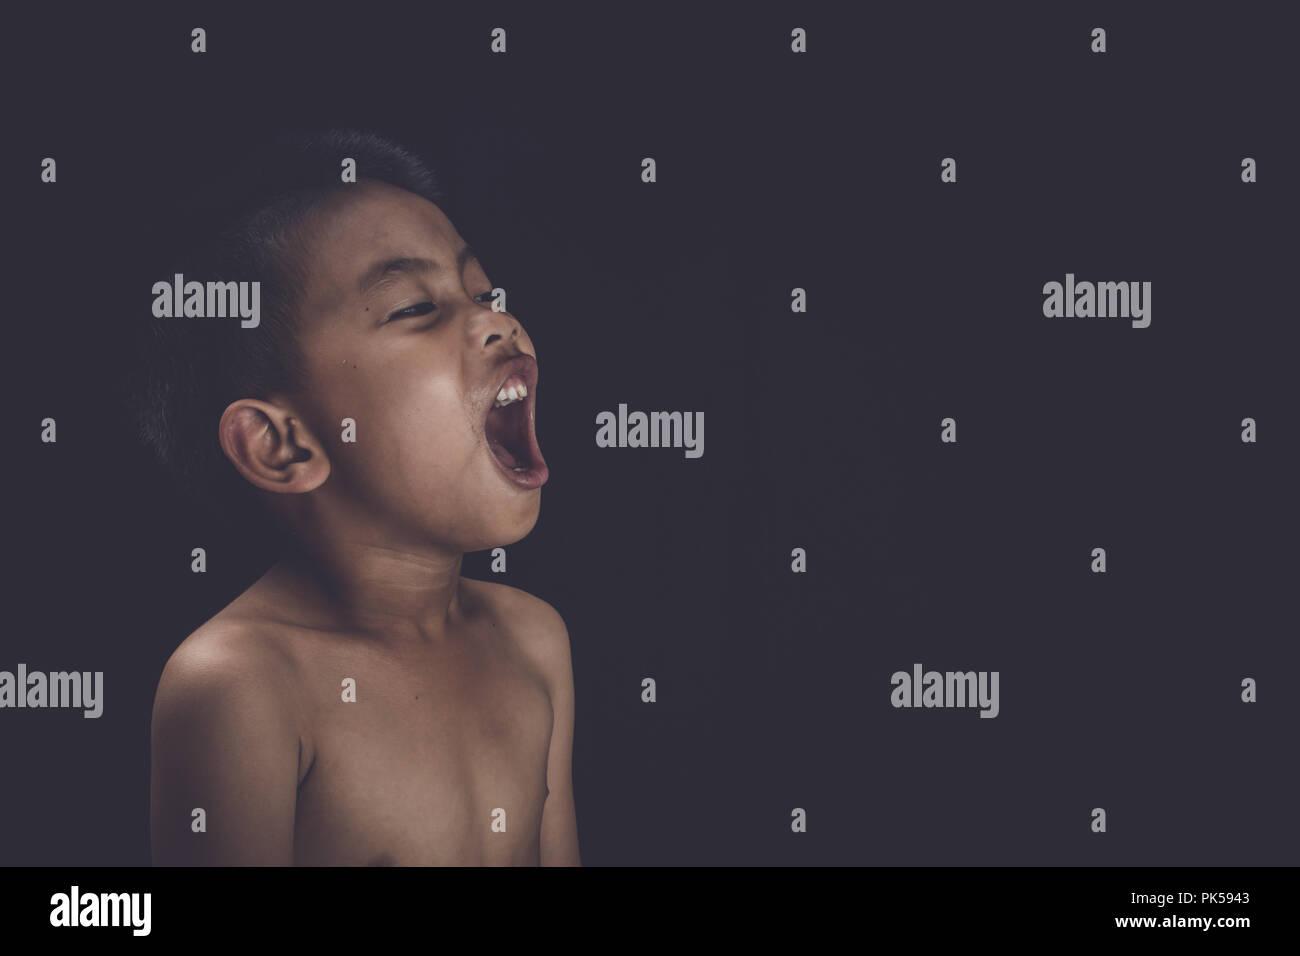 Violence in the lives of children, End violence against children concept, Children trafficking concept - Stock Image